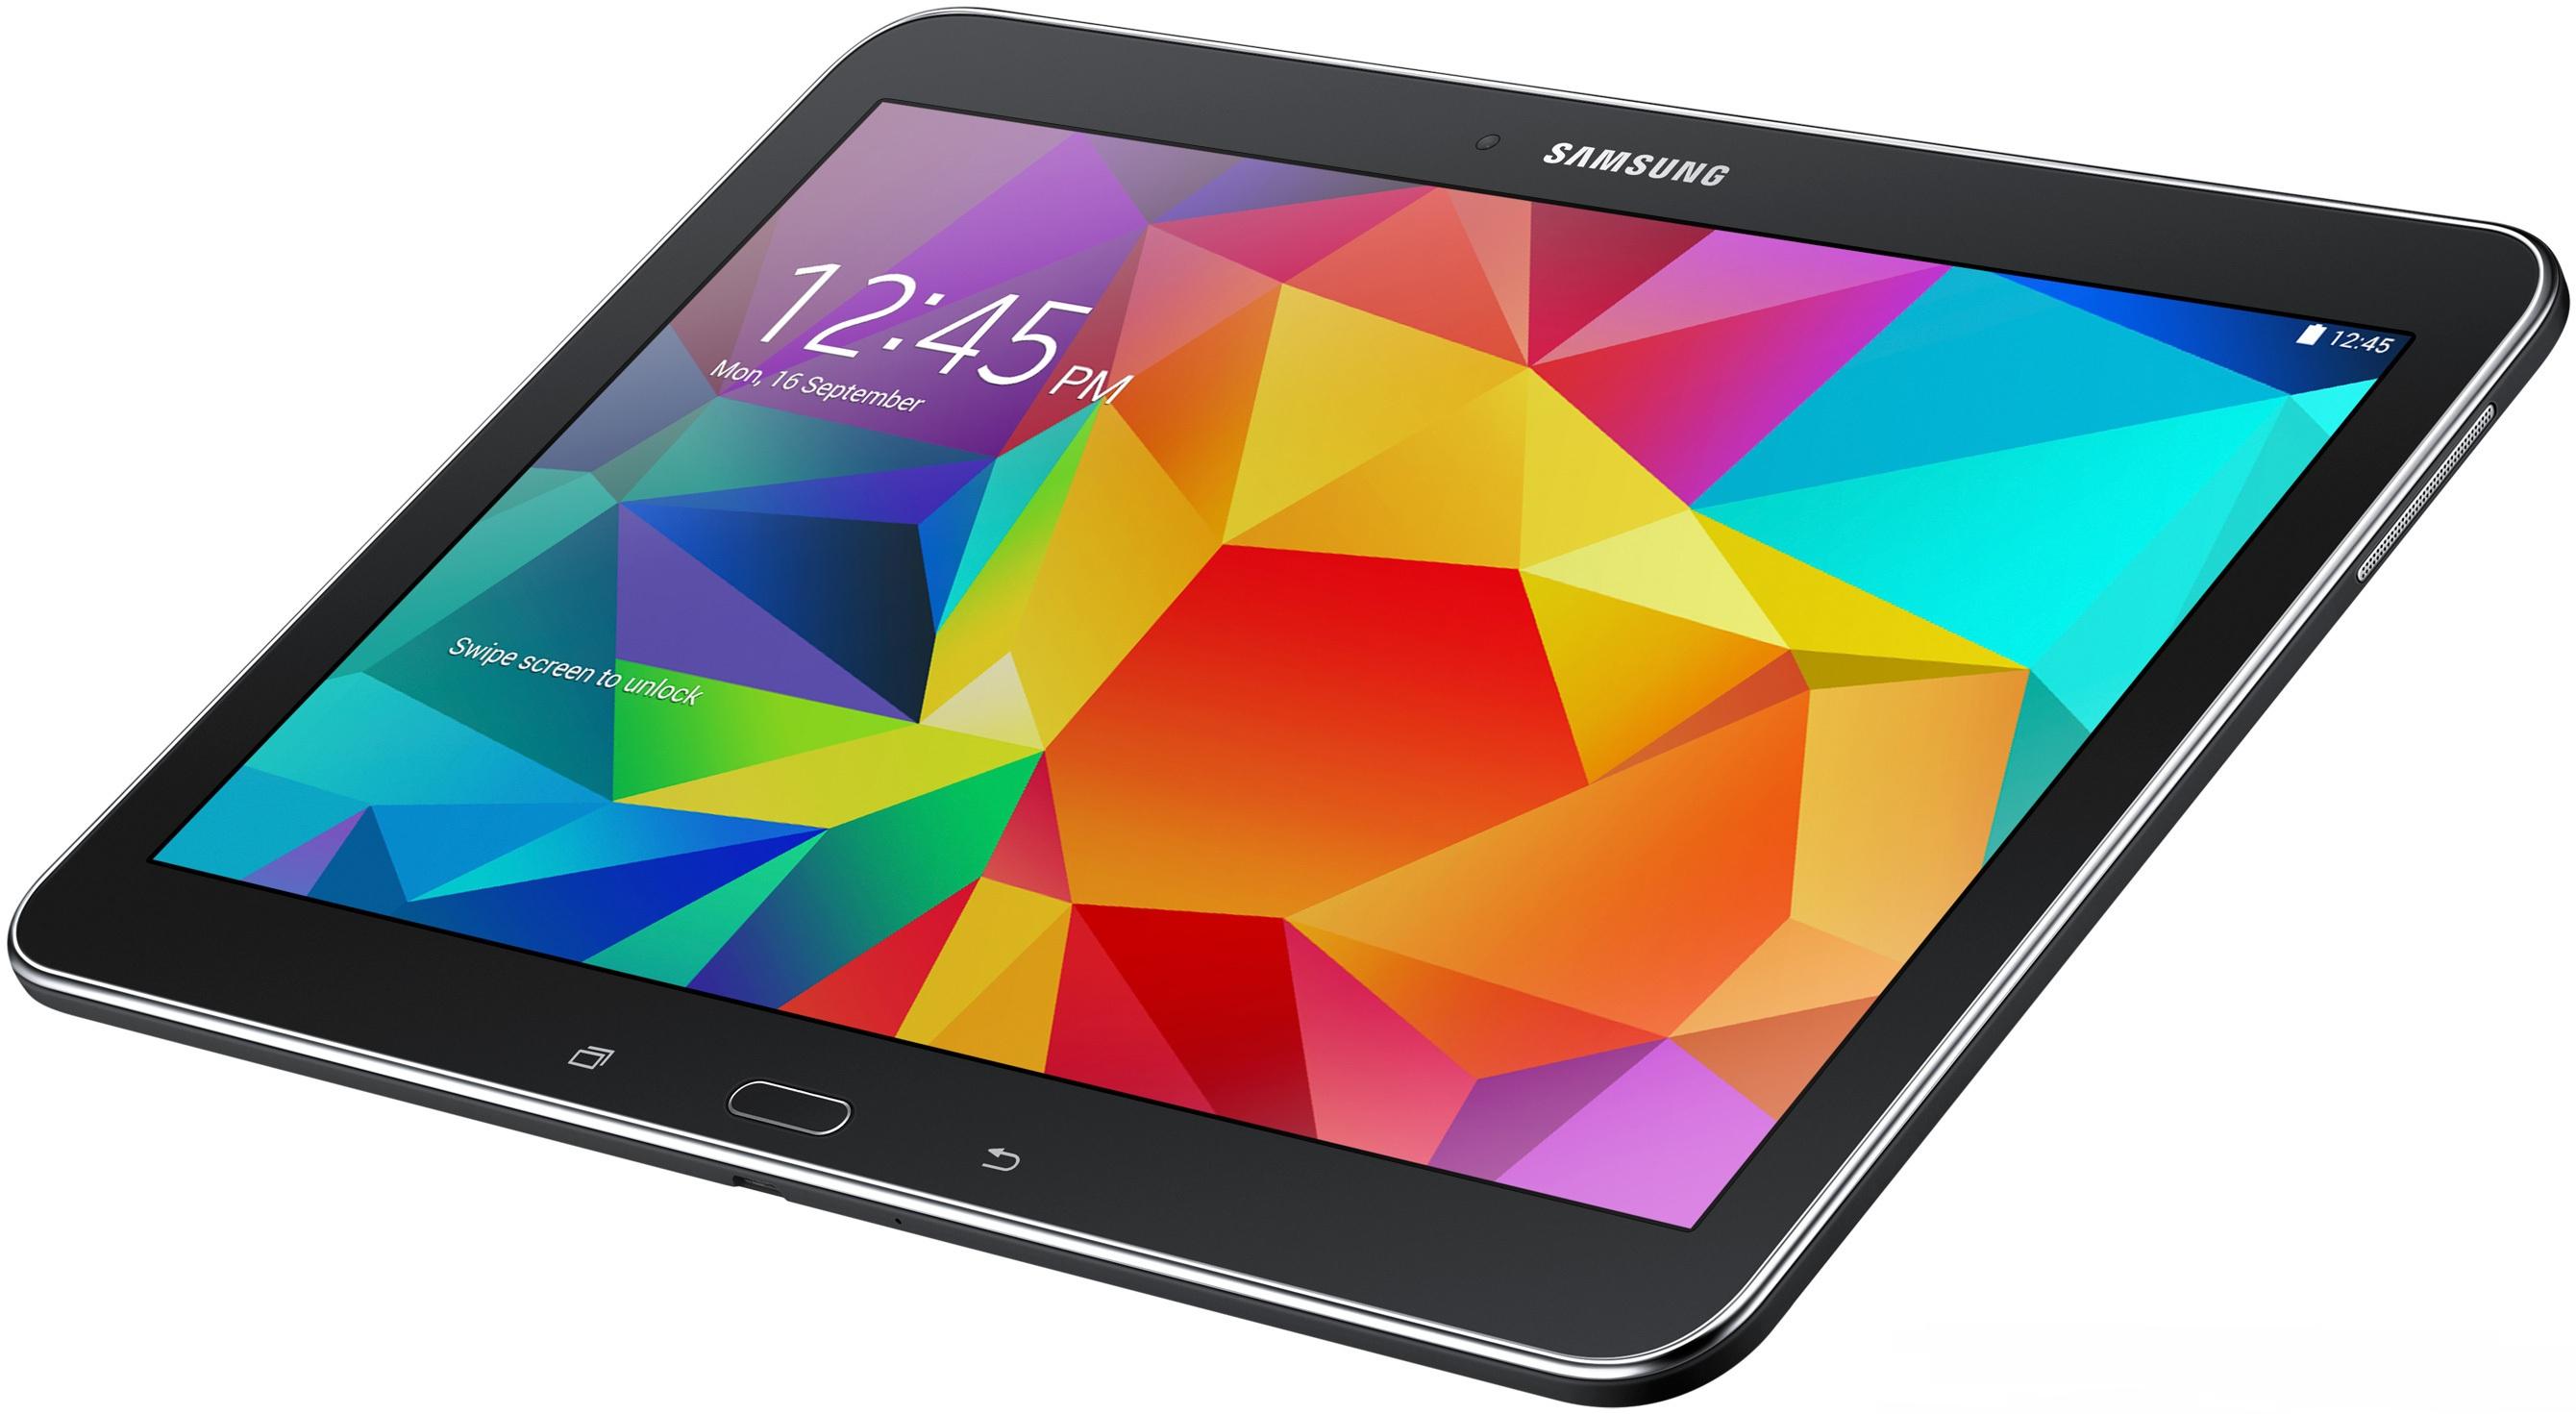 Samsung Galaxy Tab 4 10.1 SM-T531 3G 16GB Black